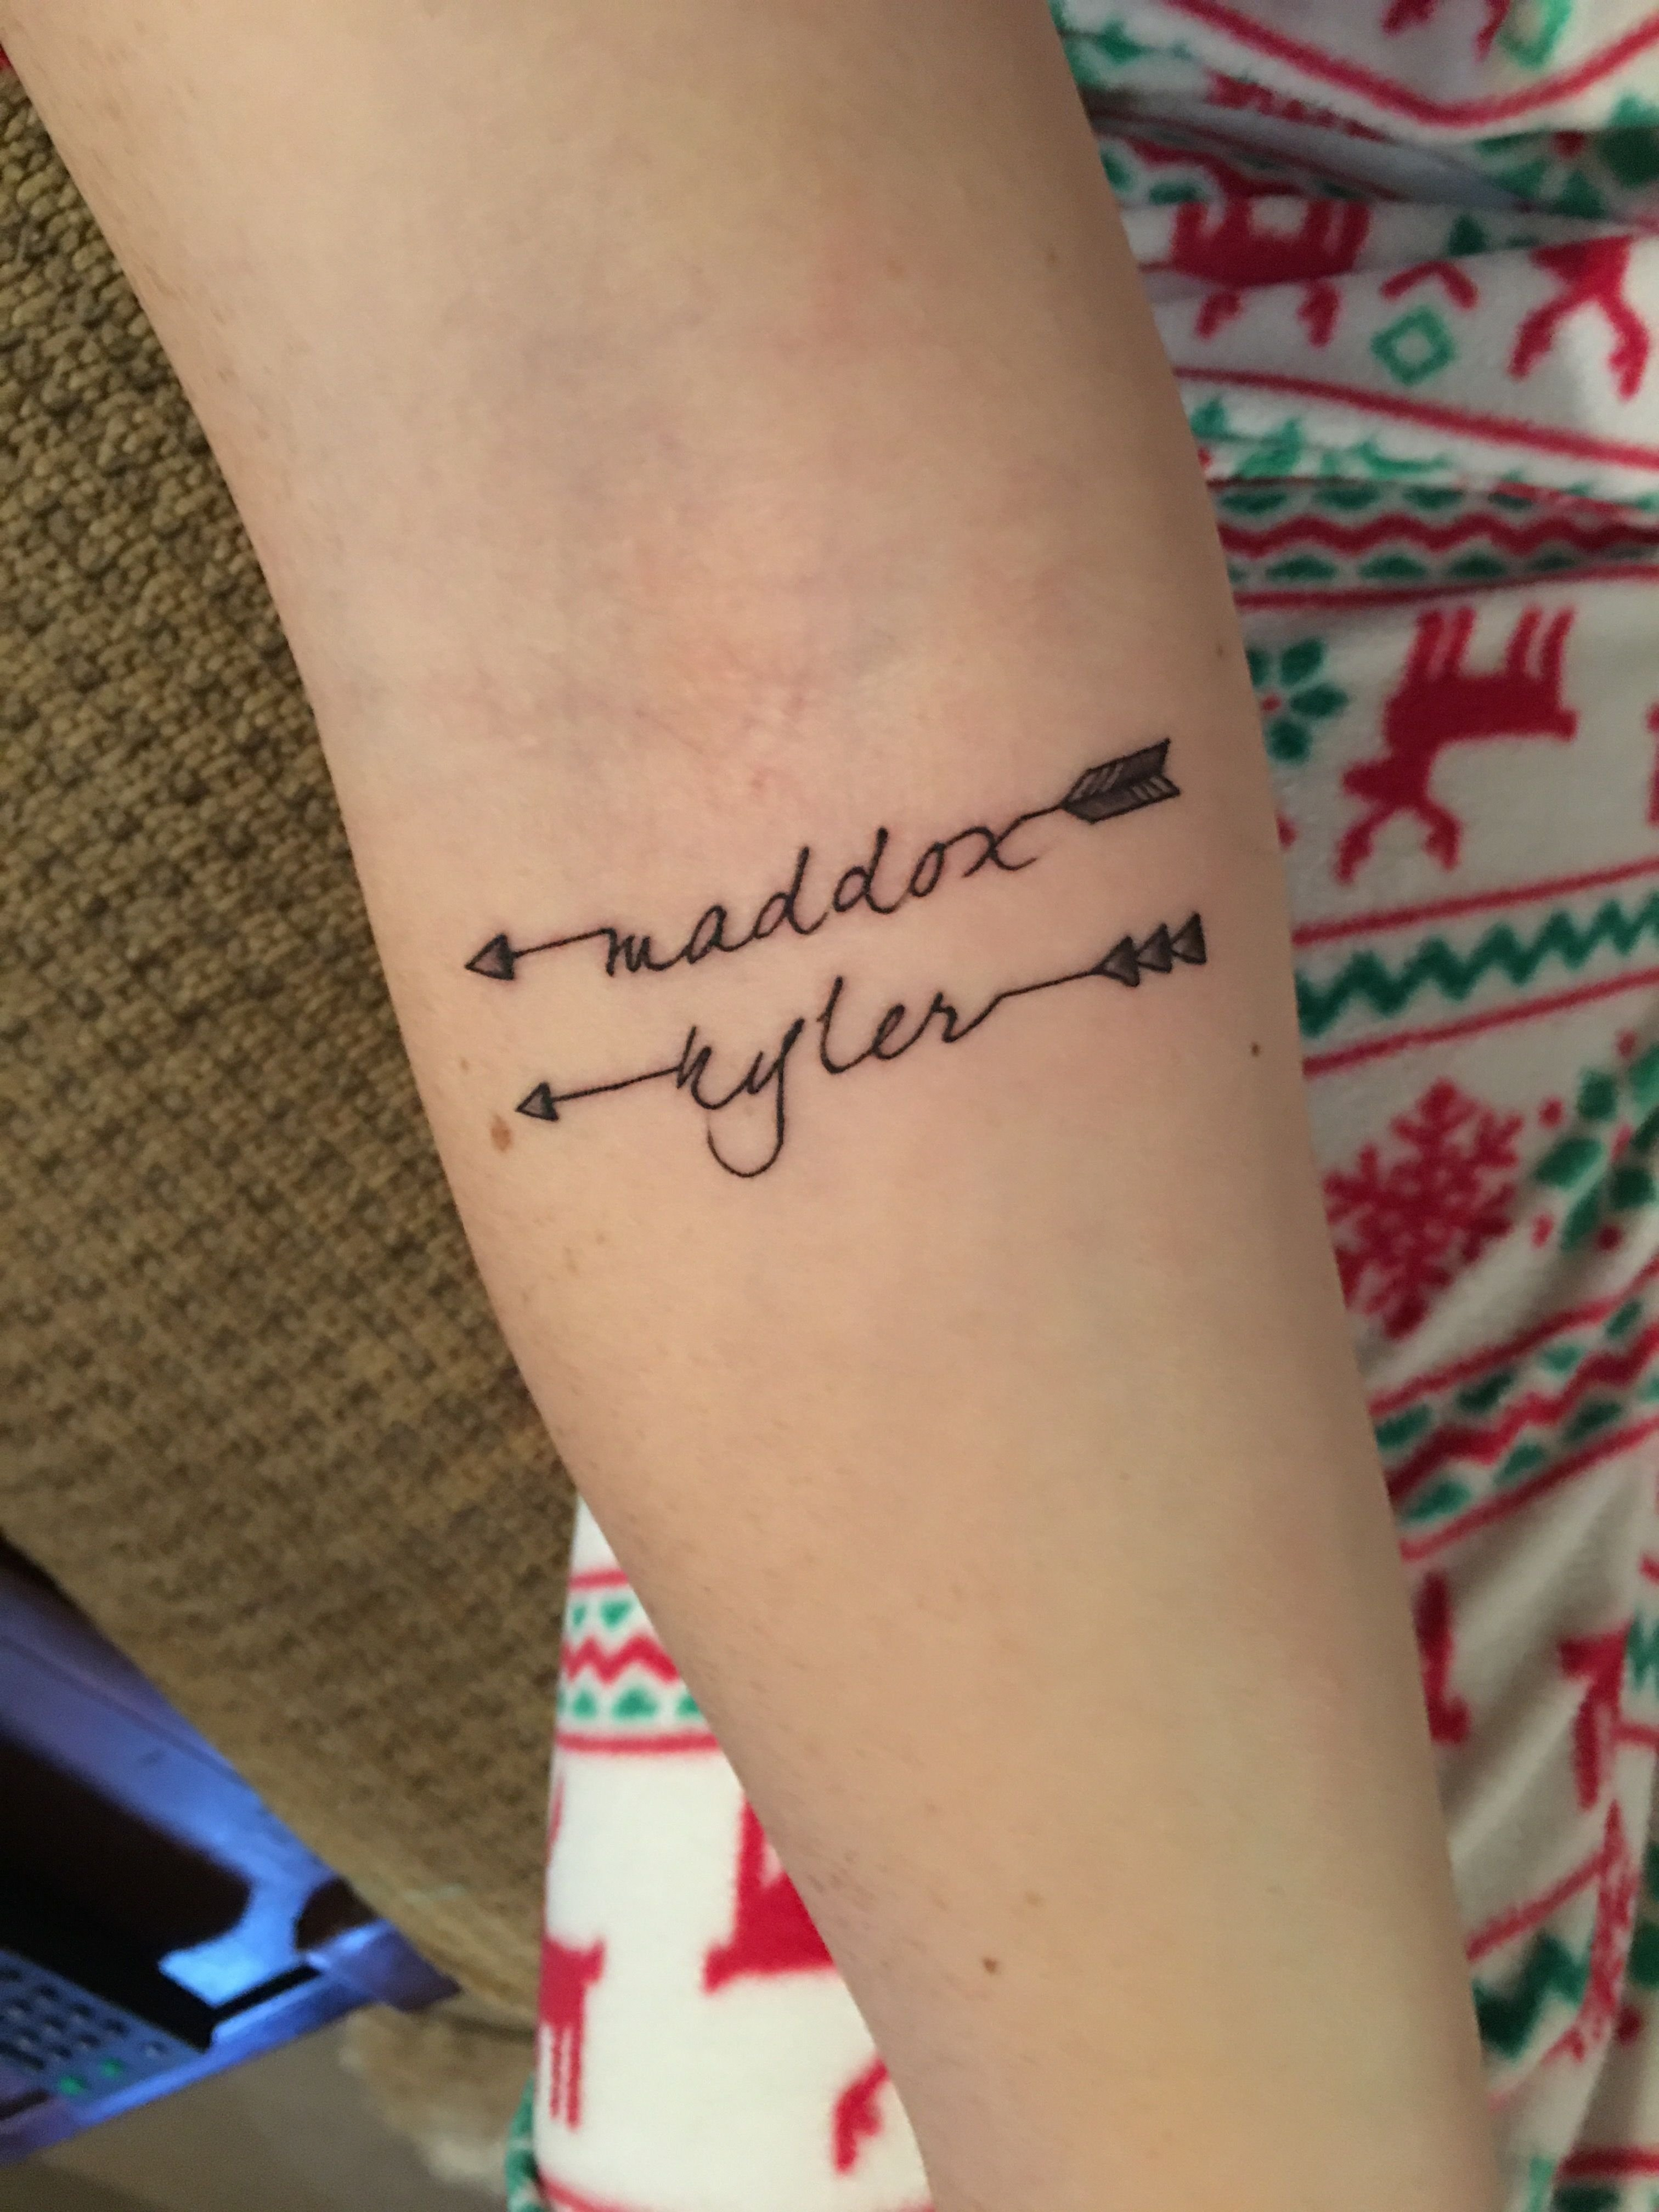 10 Fashionable Tattoo Ideas For Baby Names tattoo namen namendesigns und ideen tattoos arrow tattoo and 1 2020